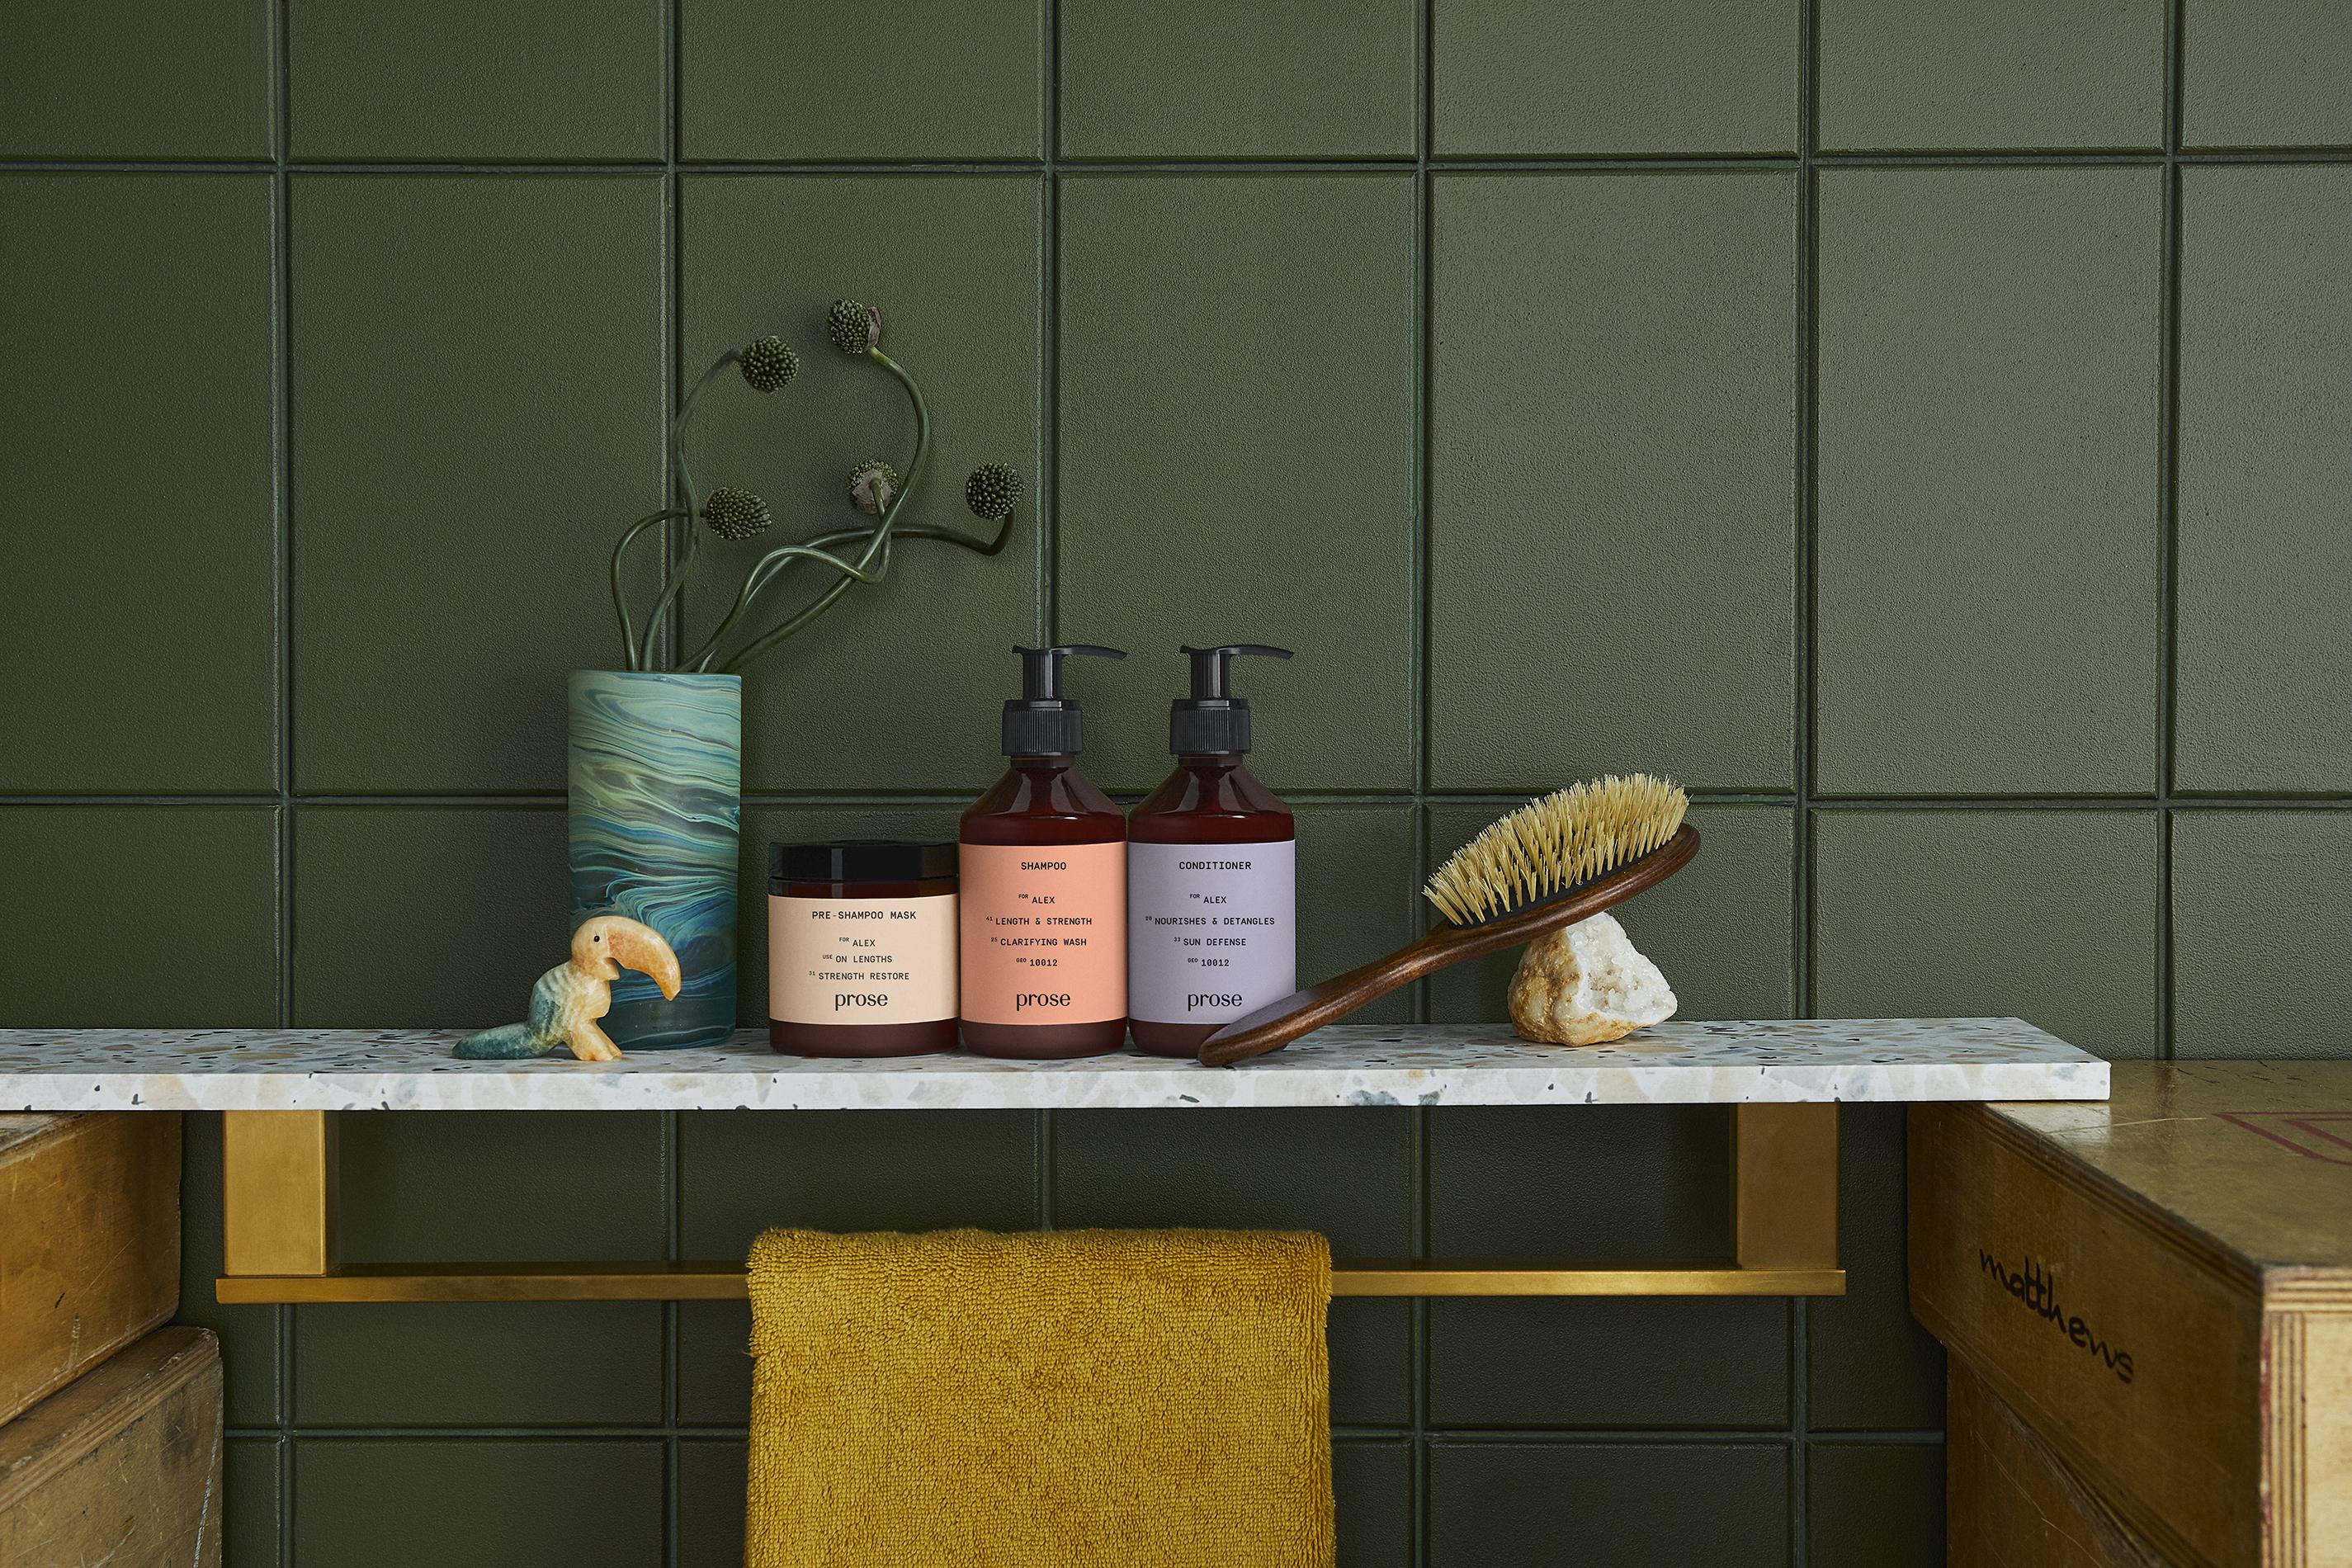 prose custom pre-shampoo hair mask, shampoo, and conditioner in a green tiled bathroom